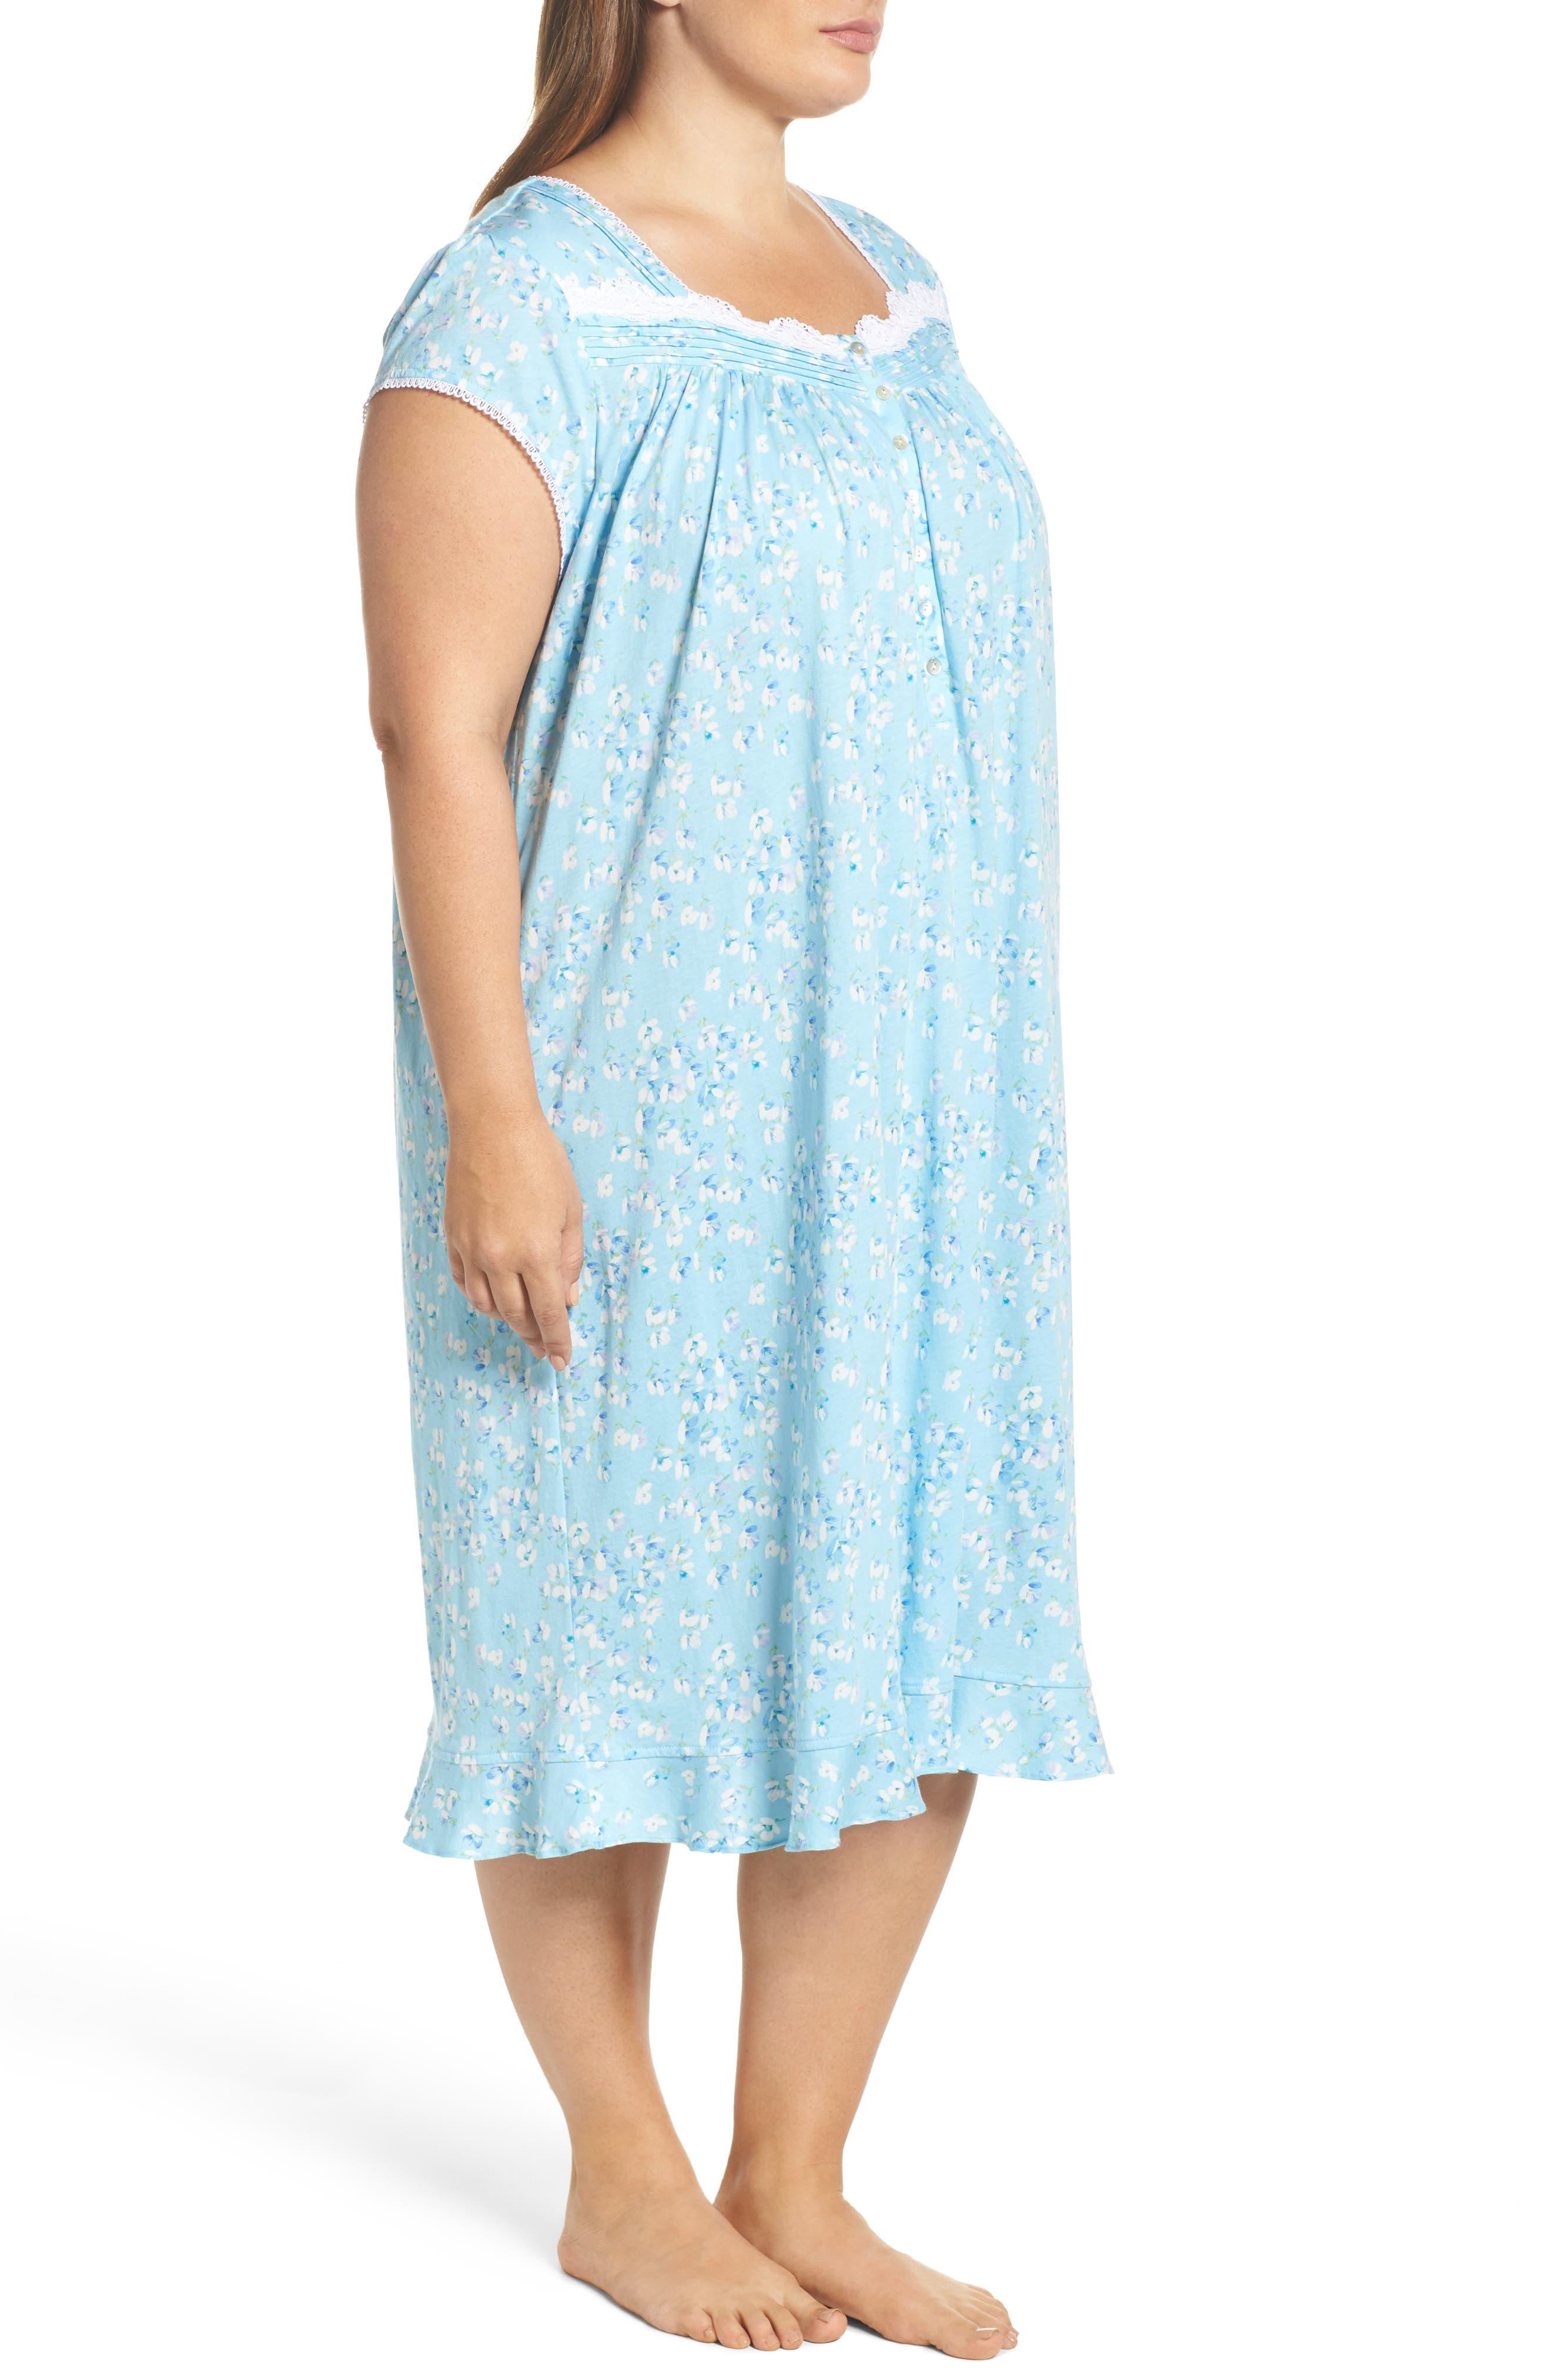 Waltz Nightgown,                             Alternate thumbnail 3, color,                             Light Sea Glass/ Multi Floral